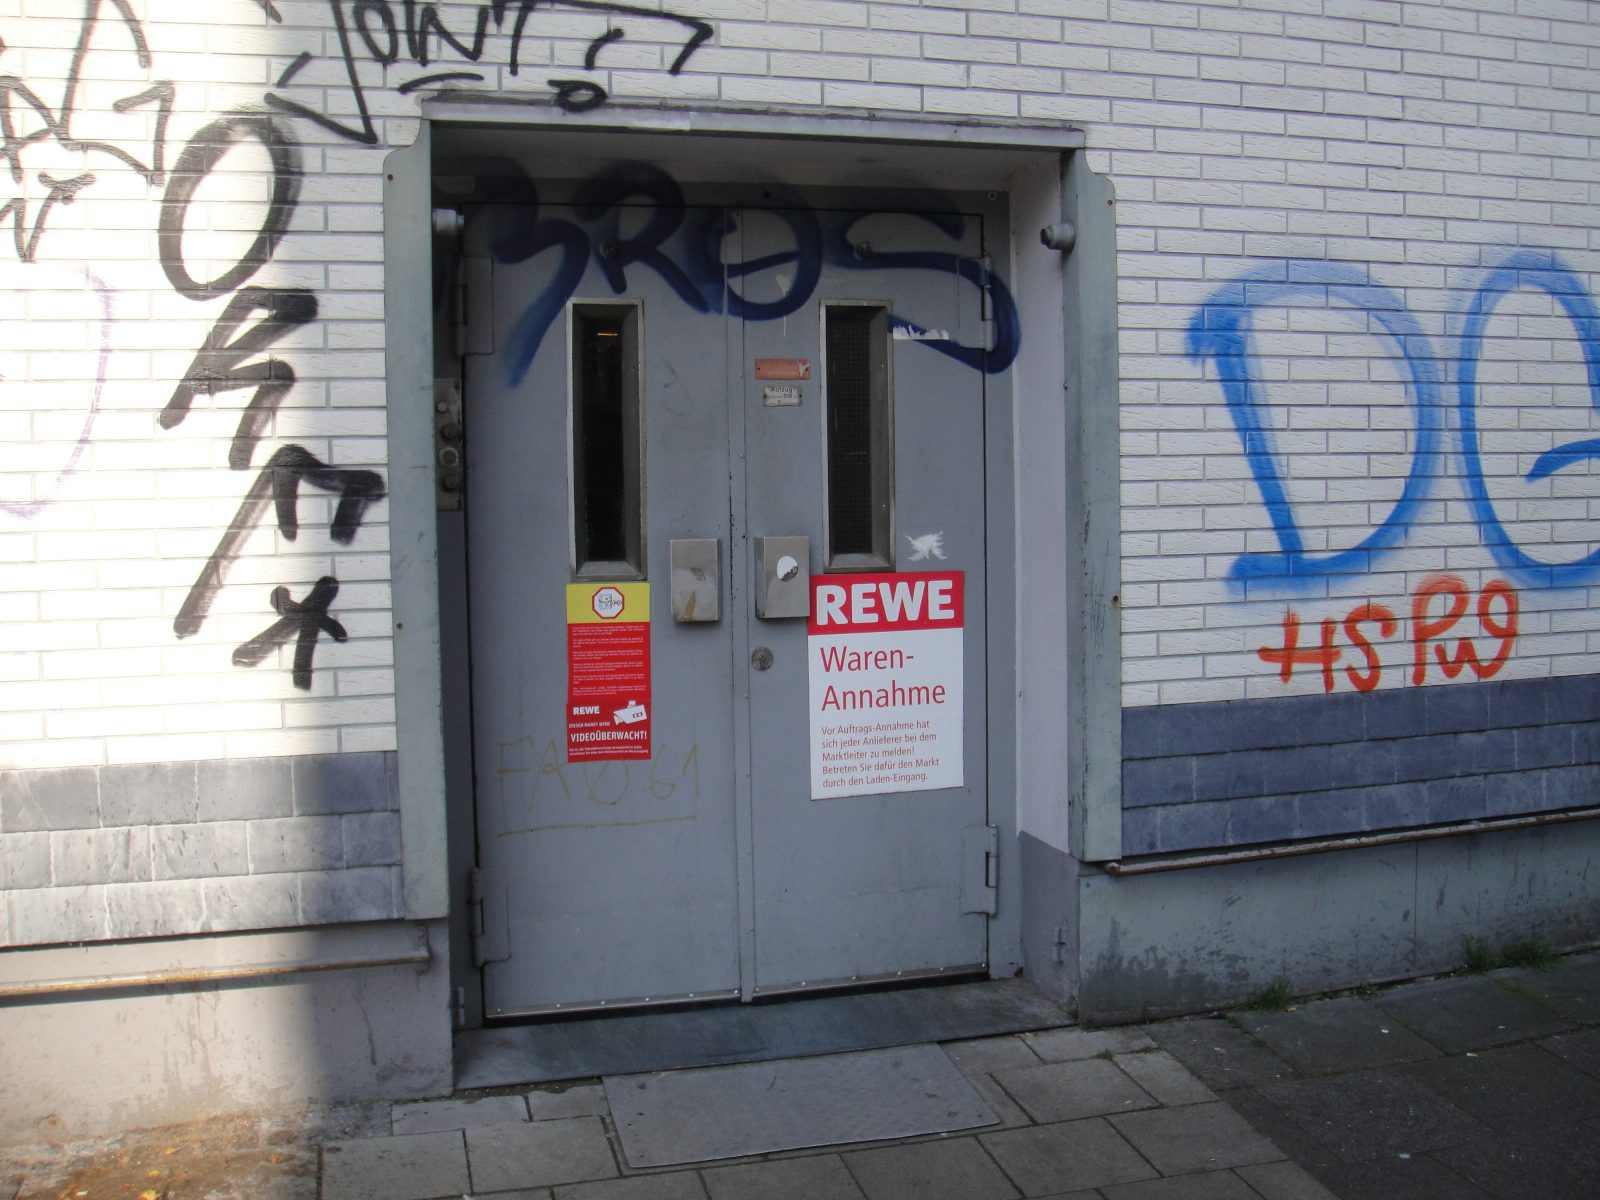 Servicepioniere_Servicekomplizen_Orte_des_Grauens_Armin_Nagel (6)